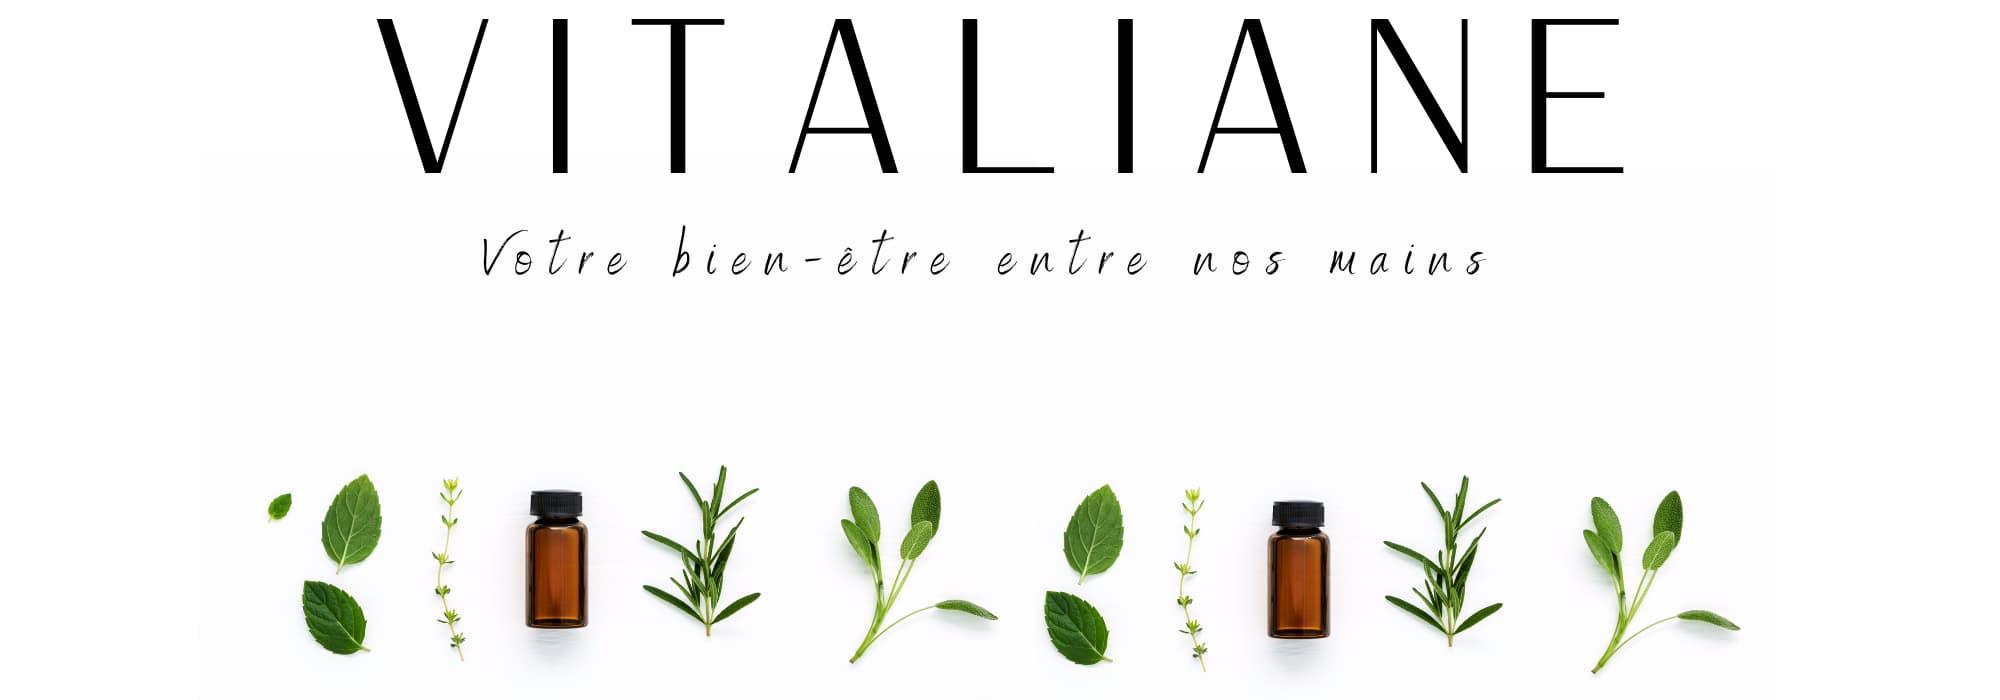 Vitaliane